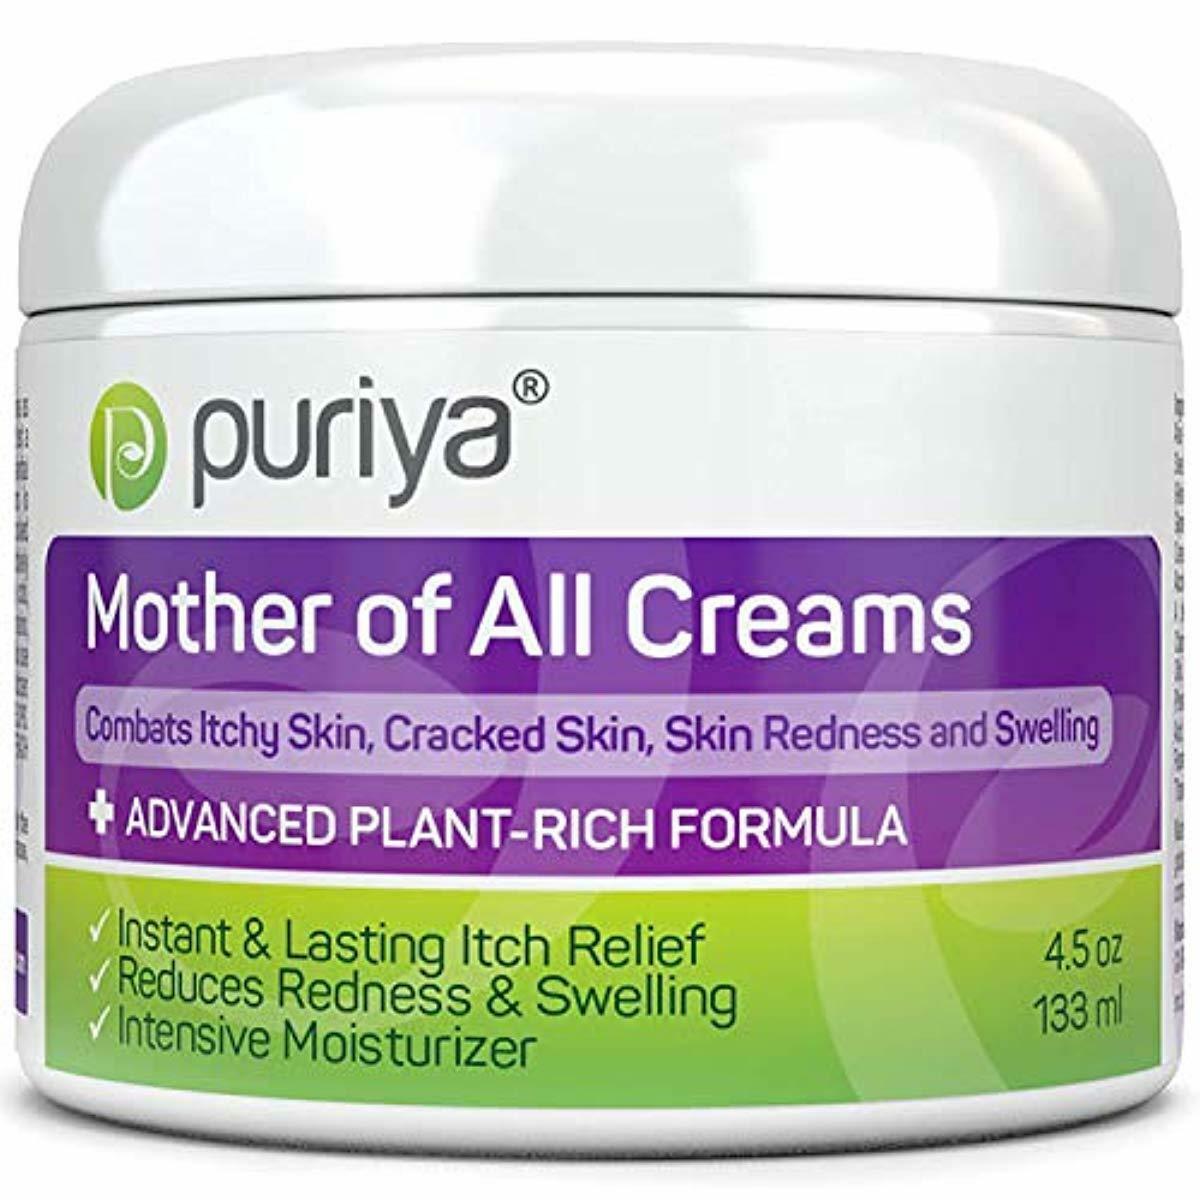 Puriya Cream for Eczema, Psoriasis, Dermatitis and Rashes. P